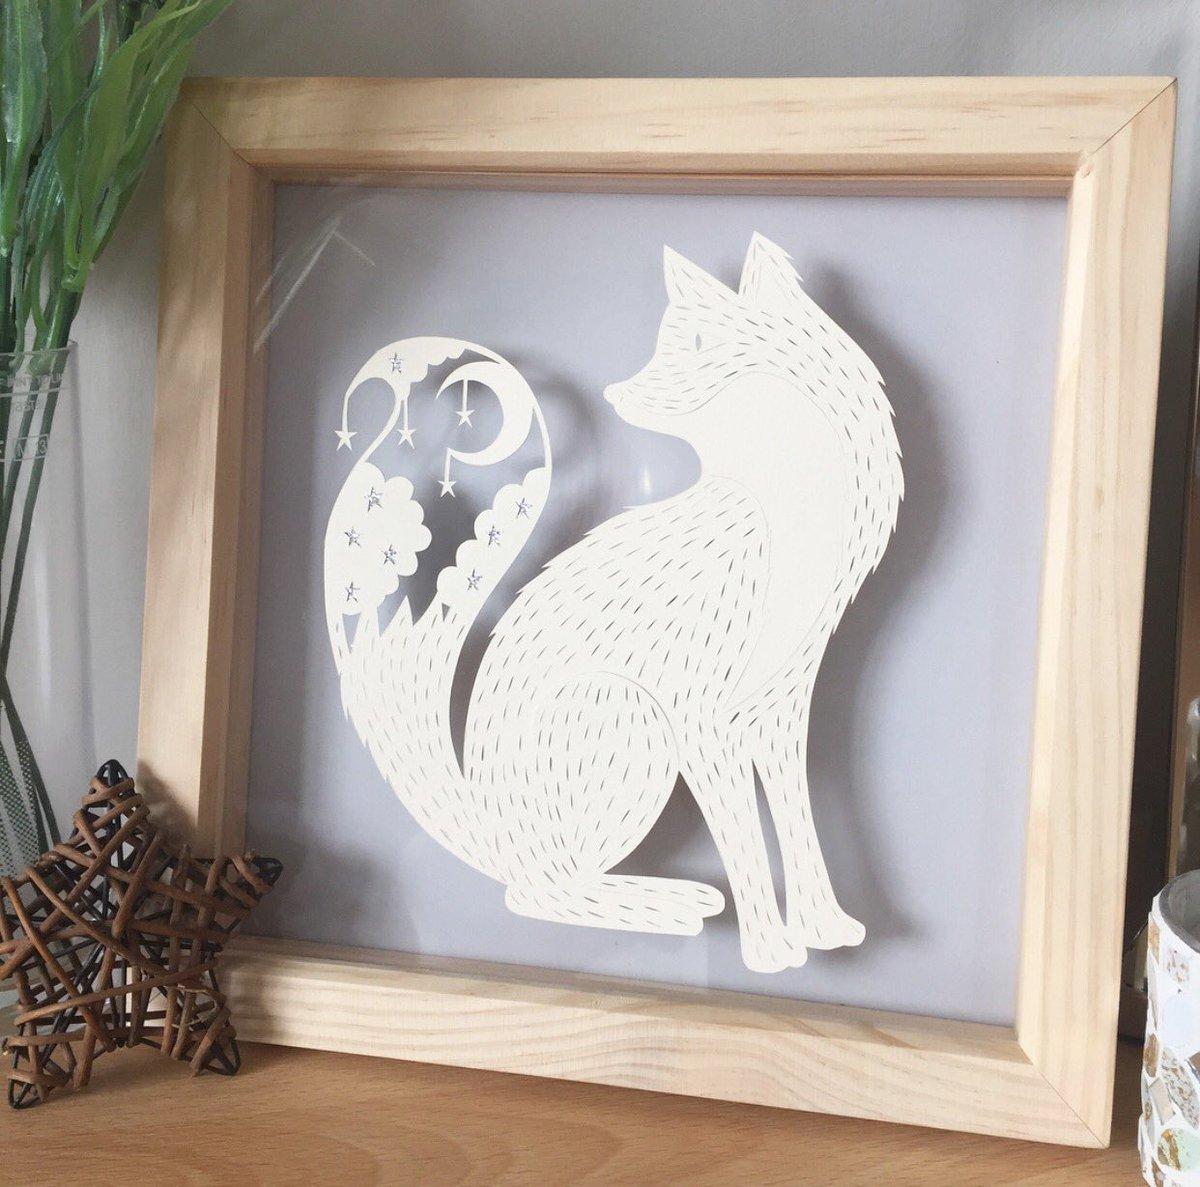 Mr Fox Papercut  #crafthour #handmade #fox #homedecor #wildlife #papercut  https://www. etsy.com/uk/listing/478 807682/fox-picture-wildlife-art-nature-art-fox?ref=shop_home_active_6 &nbsp; … <br>http://pic.twitter.com/BrWTYfJAv3